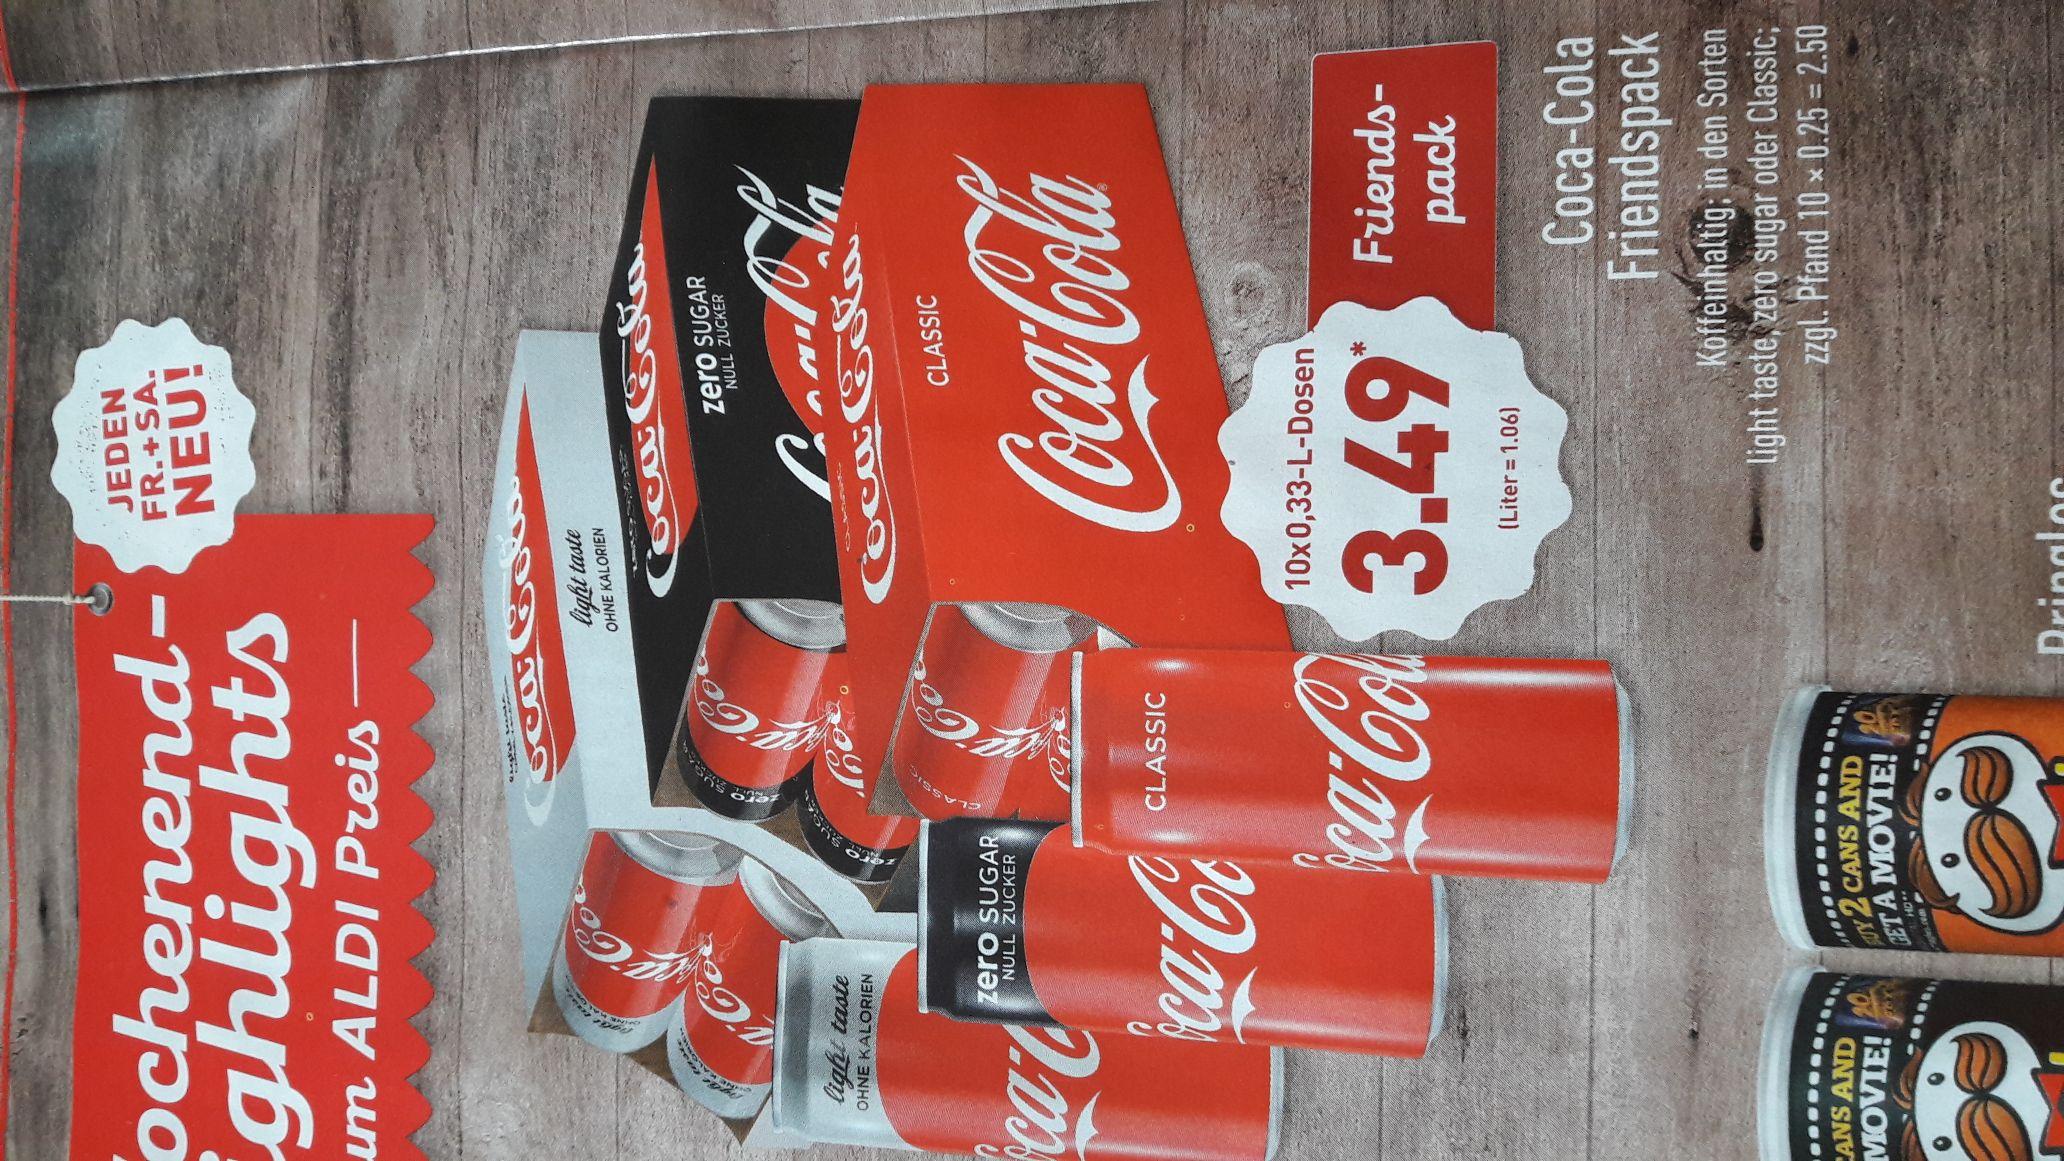 Coca Cola Friendspack ab 20.10.17 bei Aldi Nord